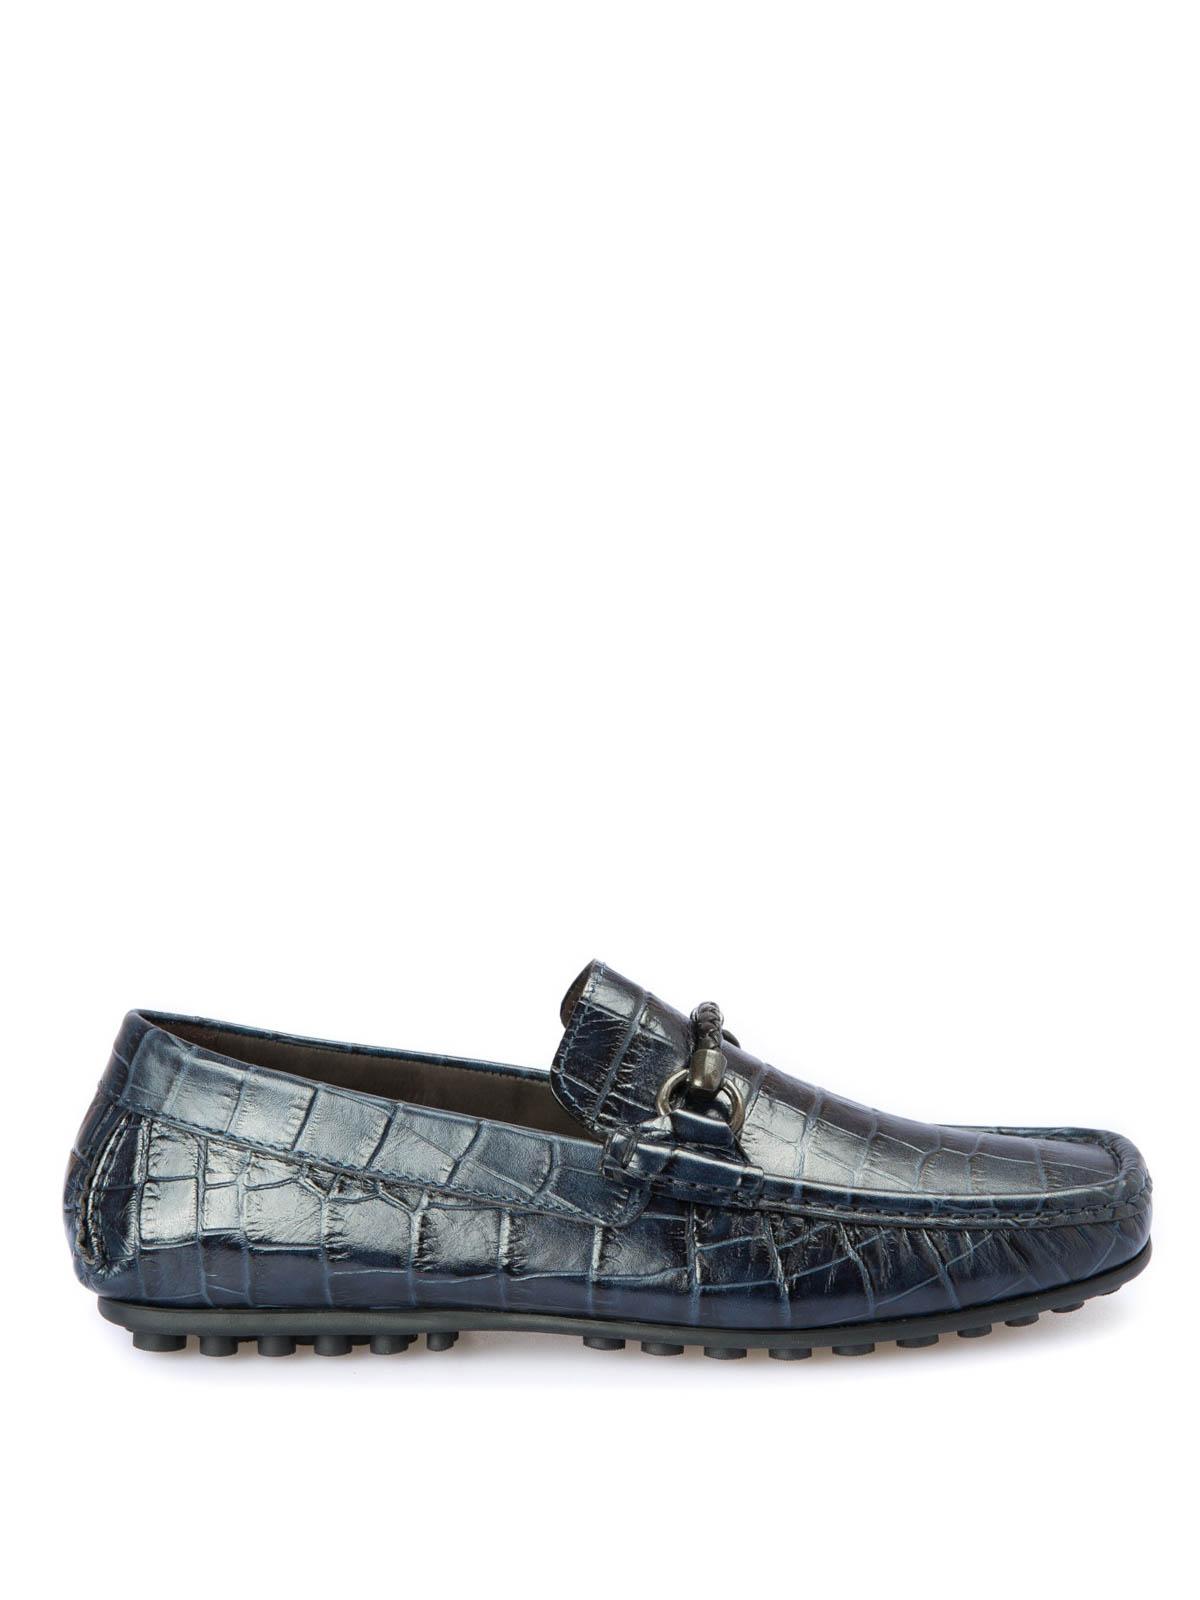 Corneliani Et Bleuamp; Chaussures Chaussons Mocassins mwv0ynN8O